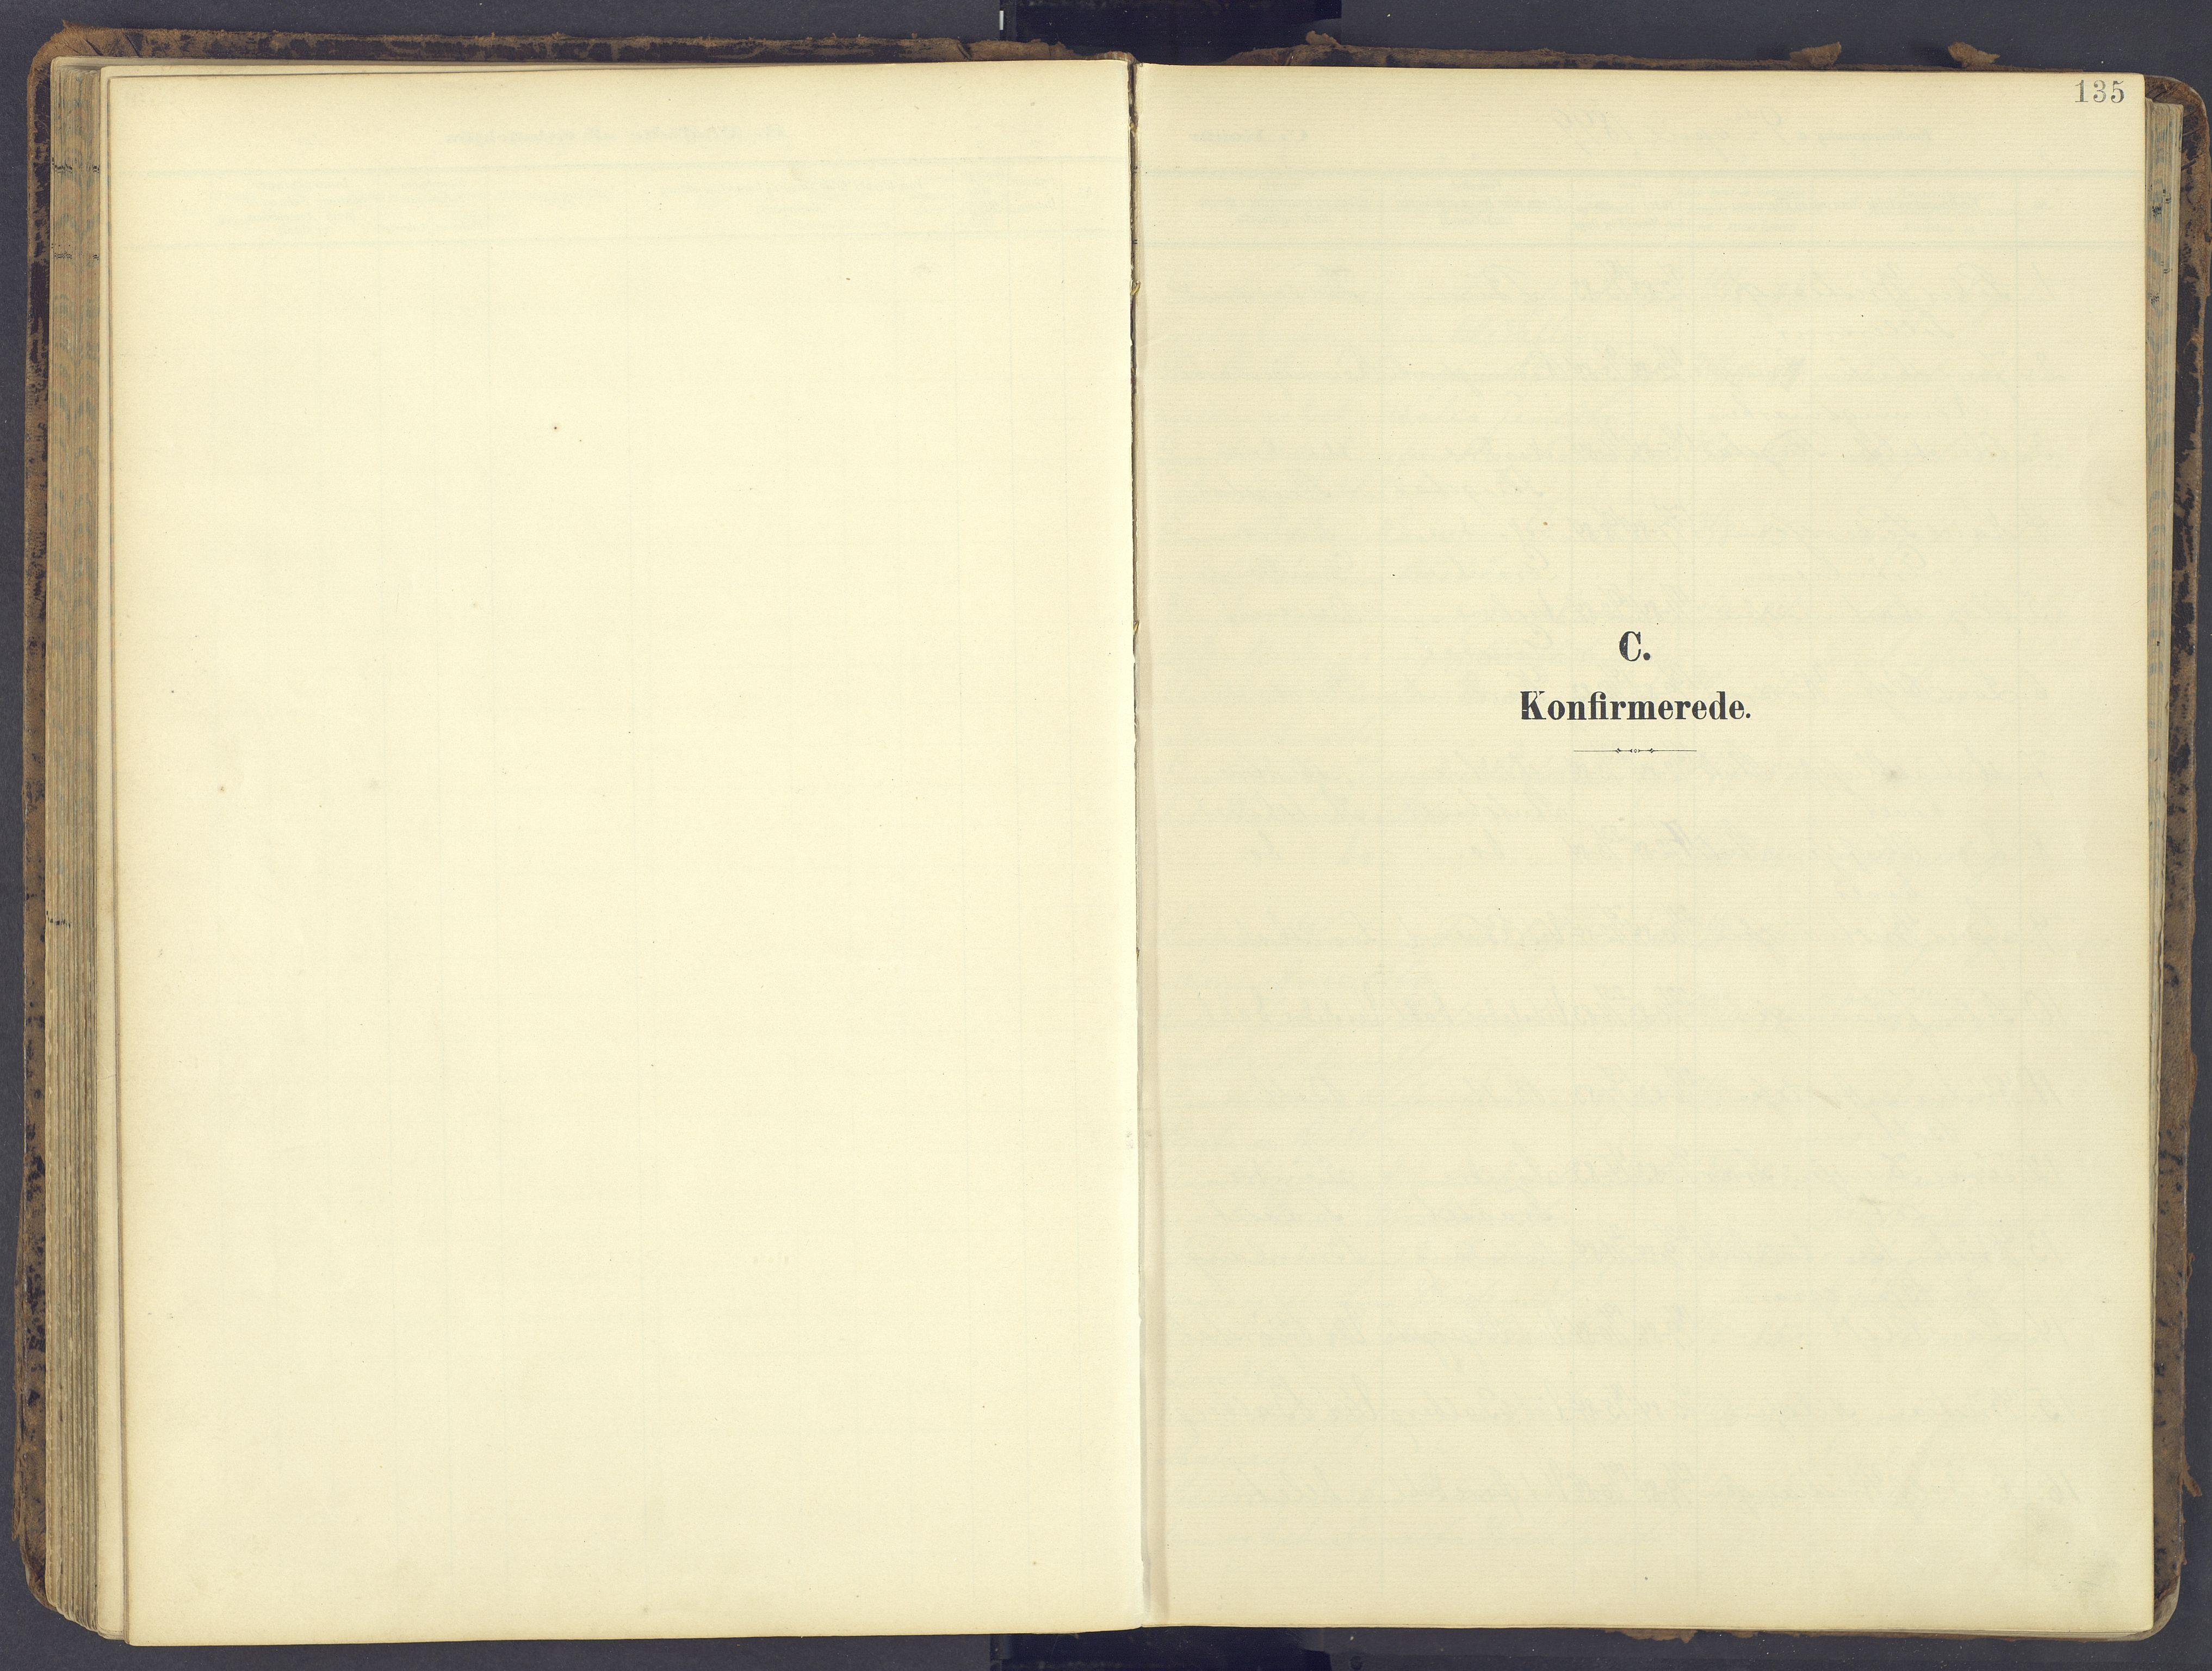 SAH, Fåberg prestekontor, Ministerialbok nr. 12, 1899-1915, s. 135